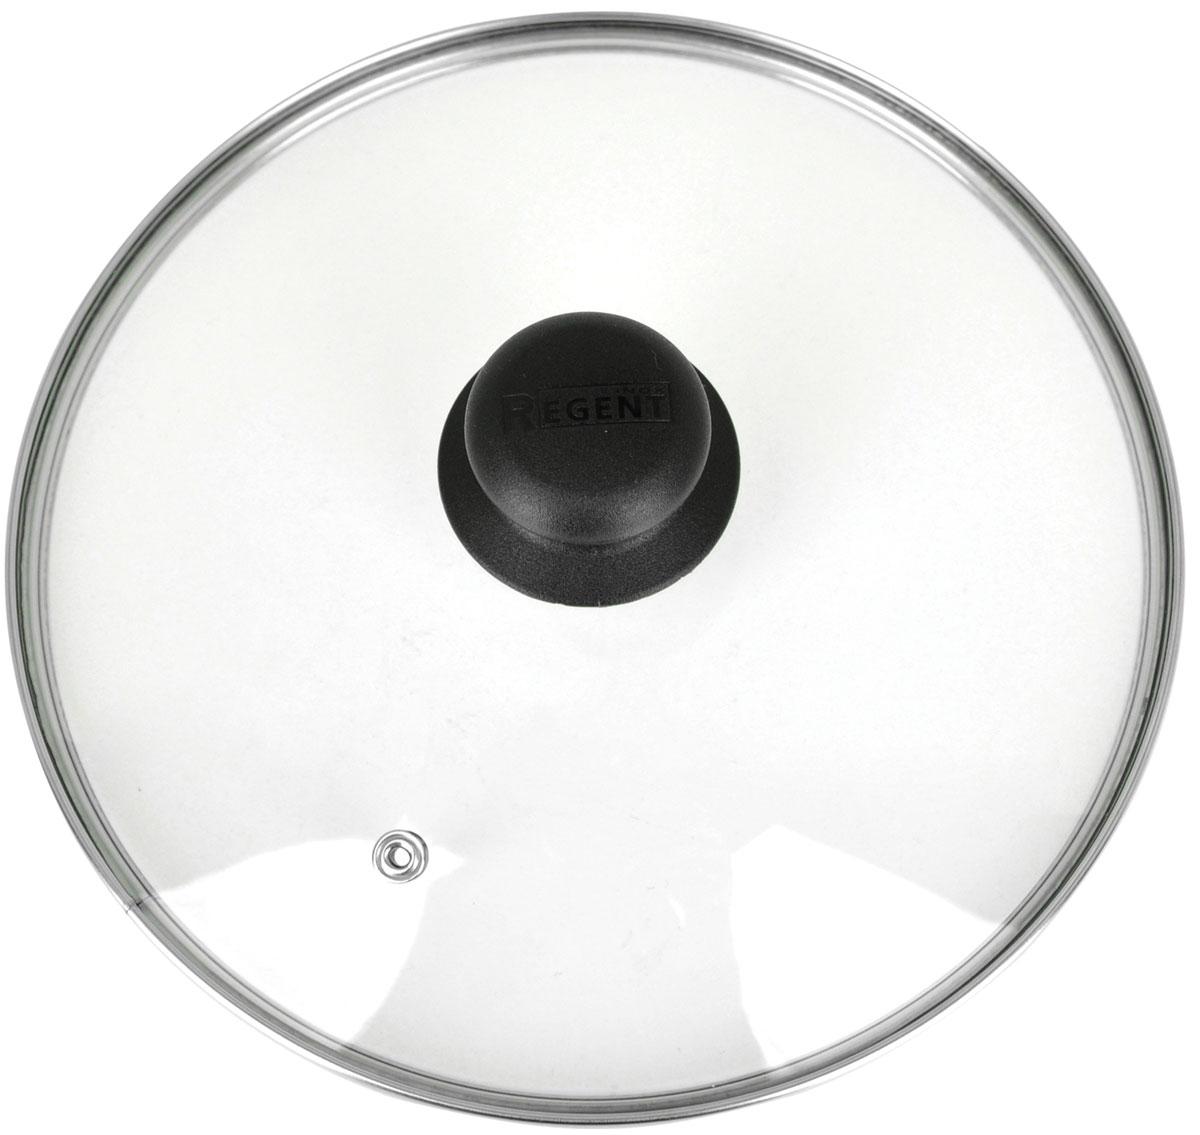 Крышка Regent Inox, стеклянная. Диаметр 28 см крышка polaris диаметр 28 см